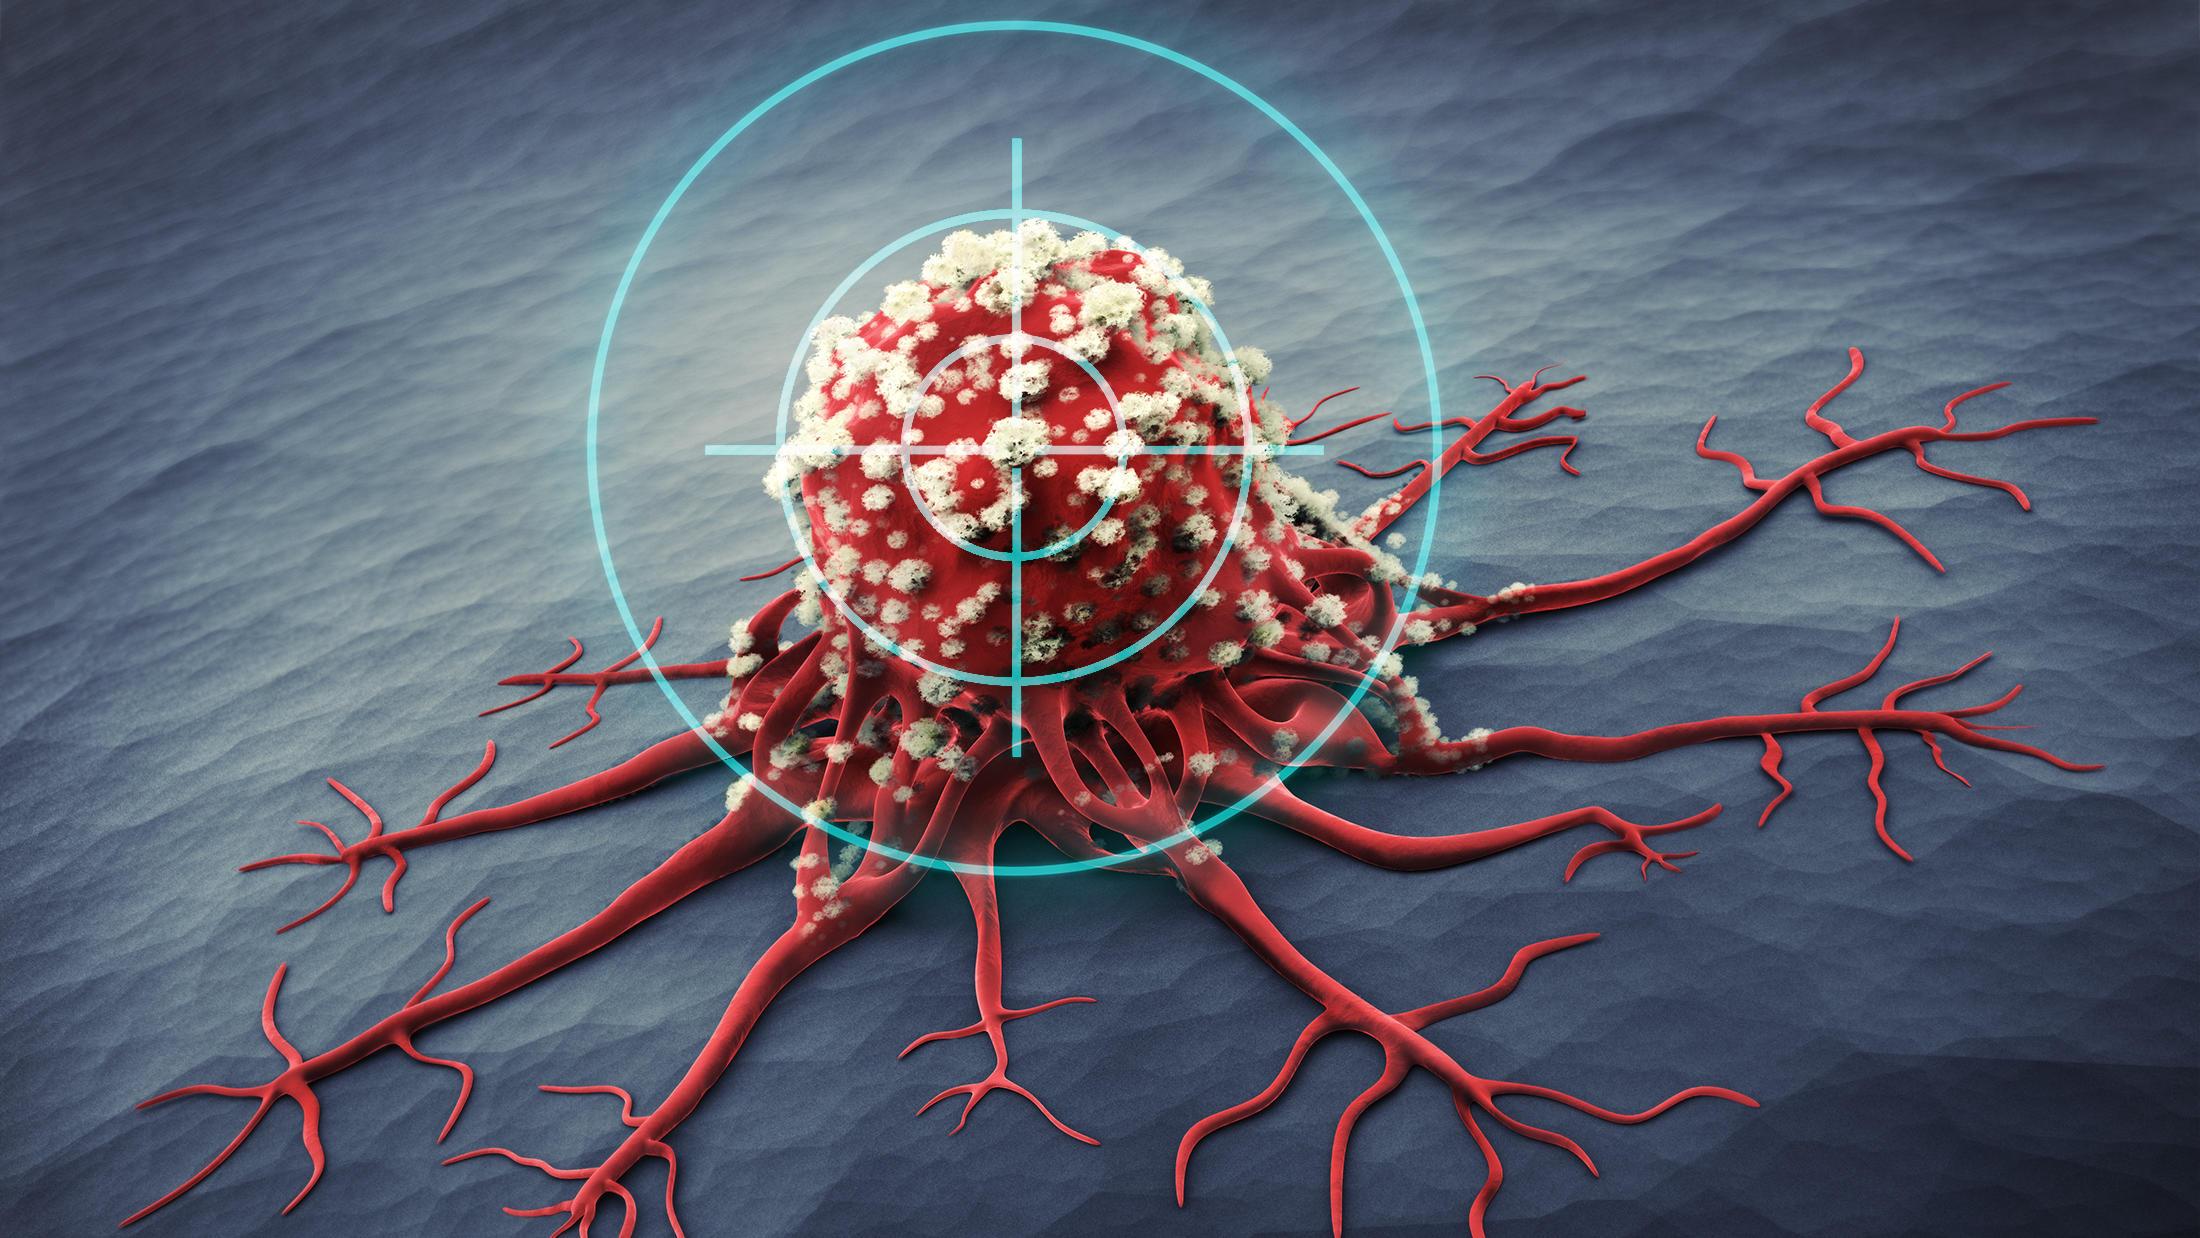 Kölner Forschern gelingt Durchbruch im Kampf gegen Krebs